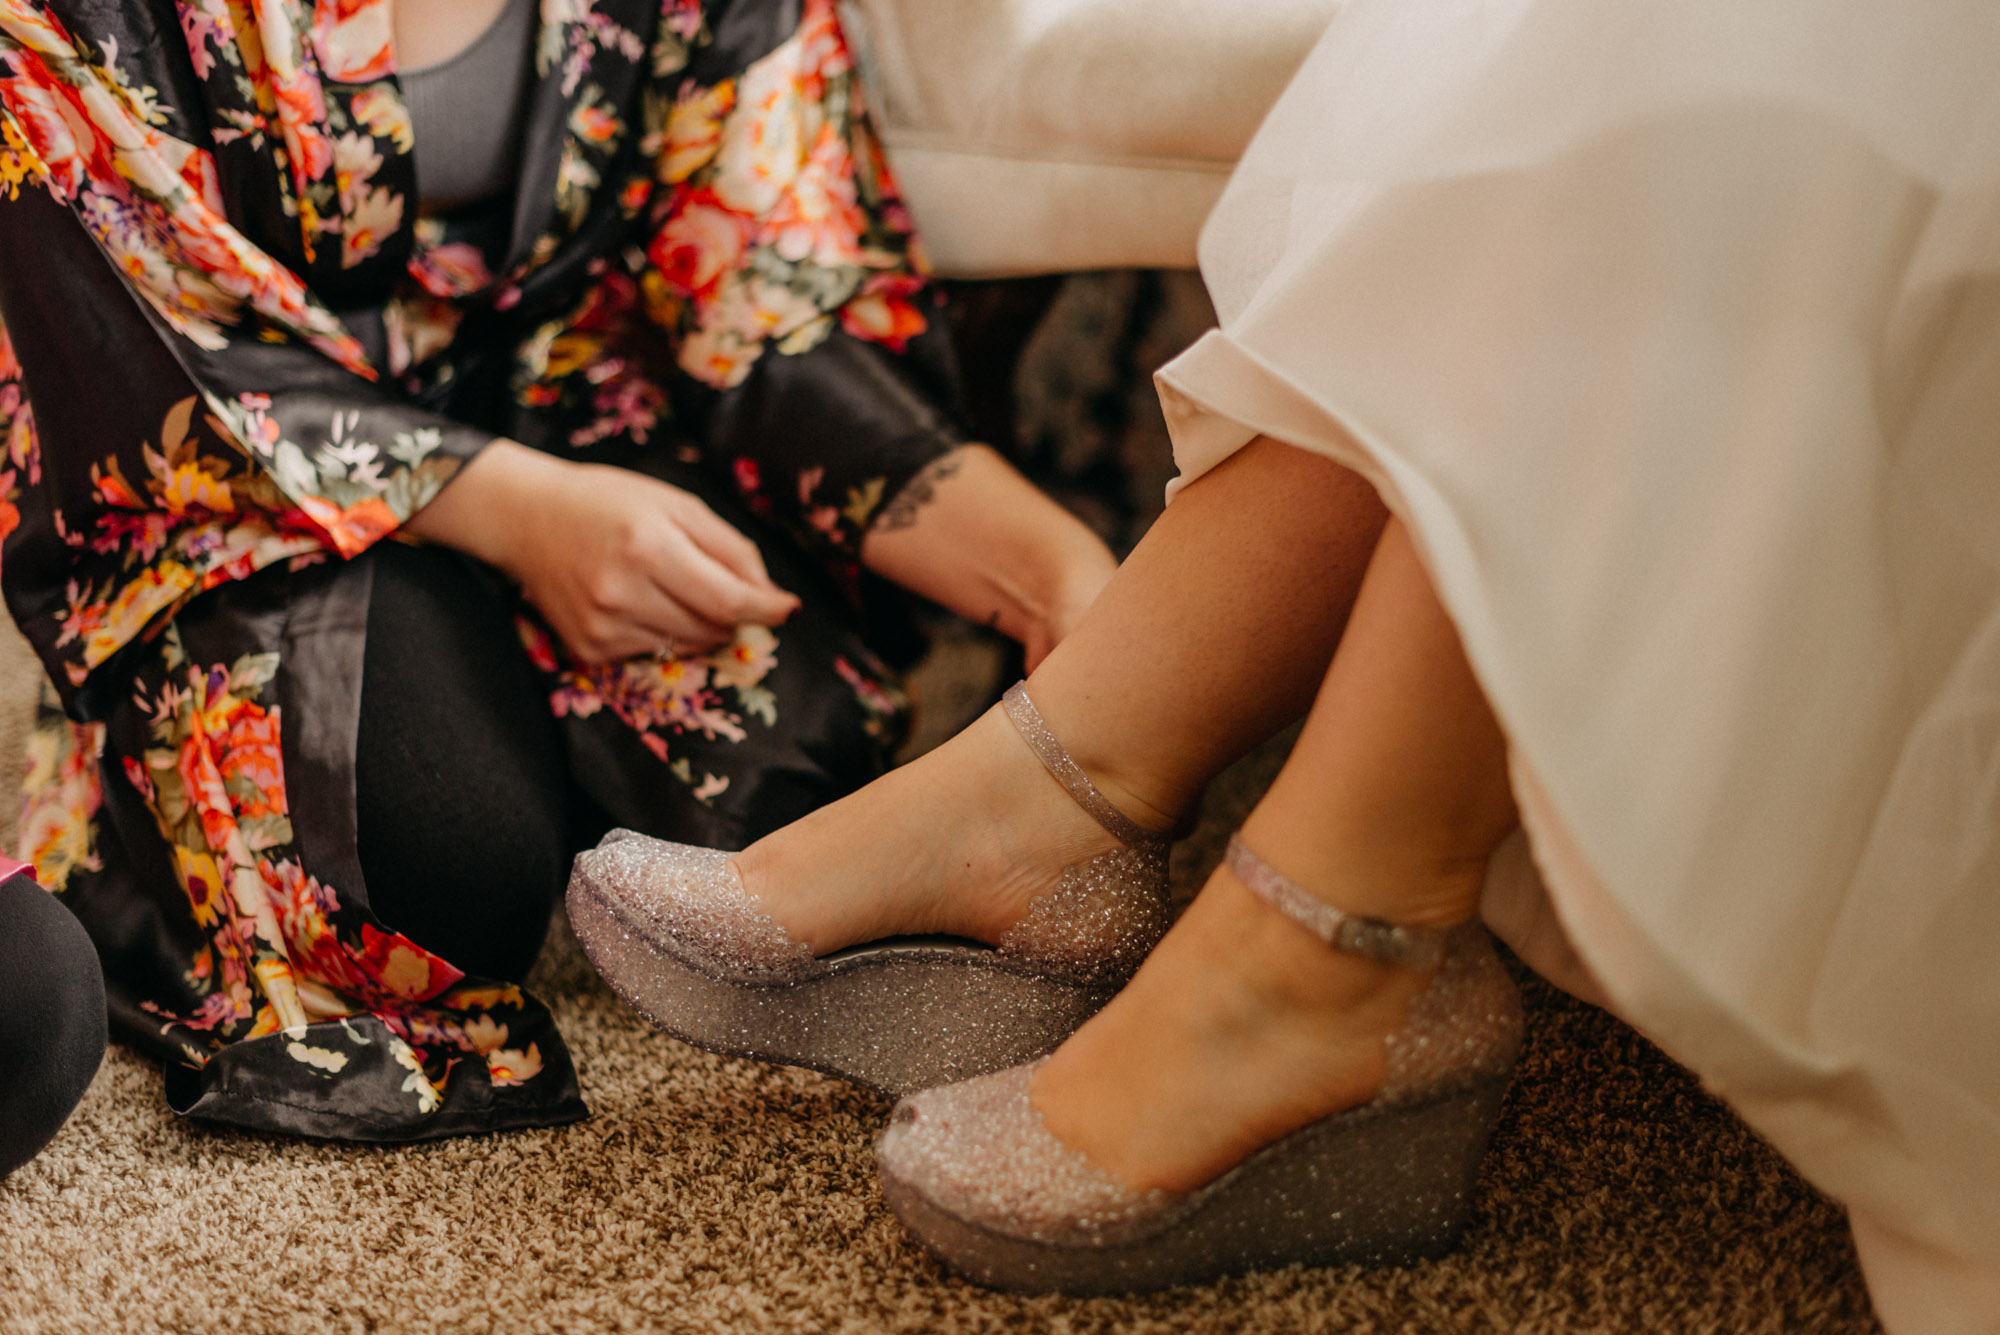 Getting-Ready-Swingset-Washington-Wedding-ringshot-5109.jpg